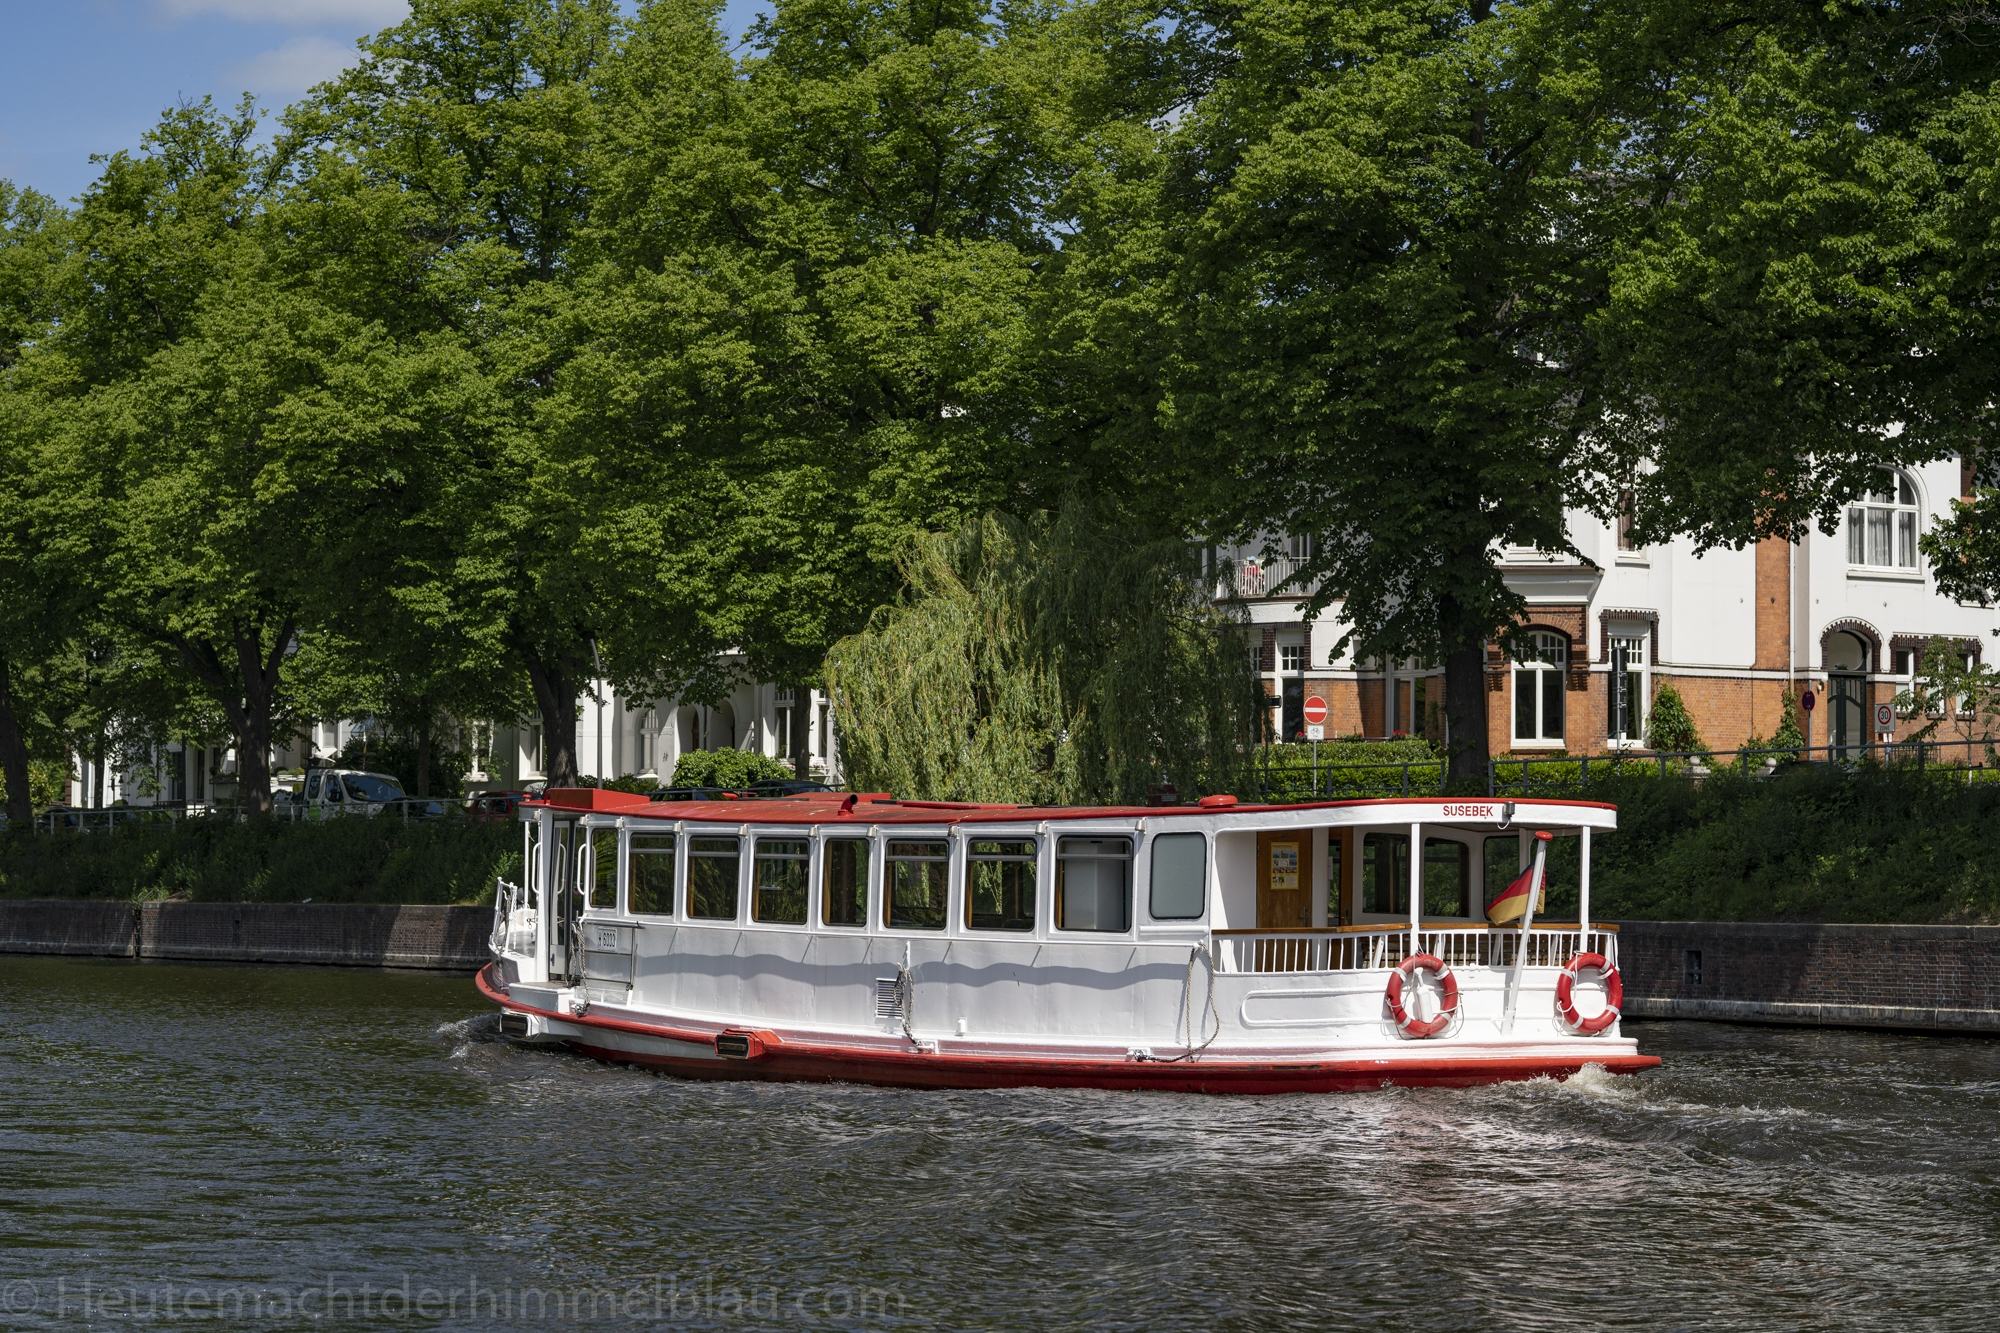 Alsterschifffahrt